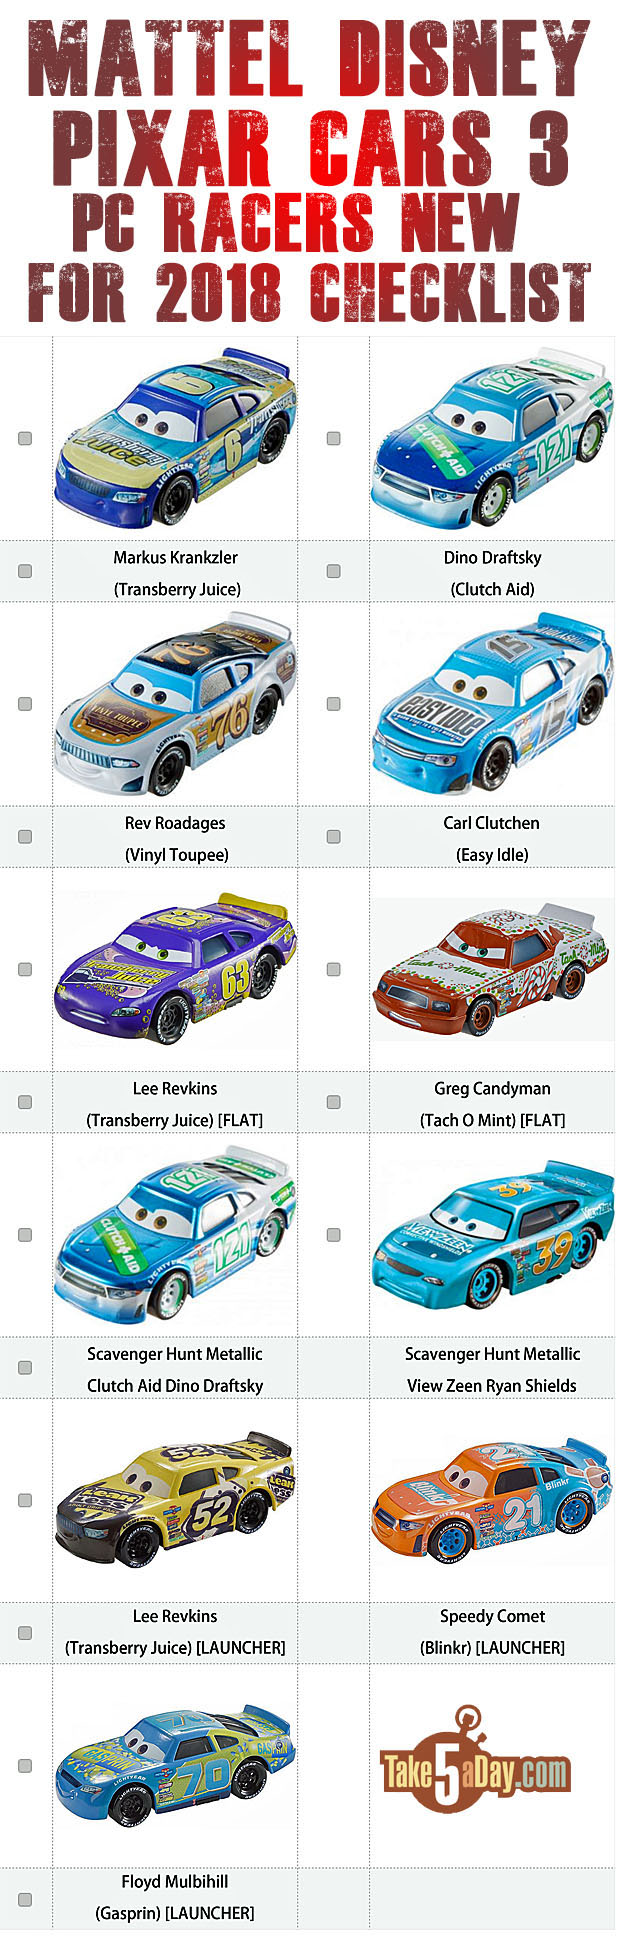 "Mattel Disney Pixar CARS: Piston Cup ""New"" Racers 2018 Checklist"